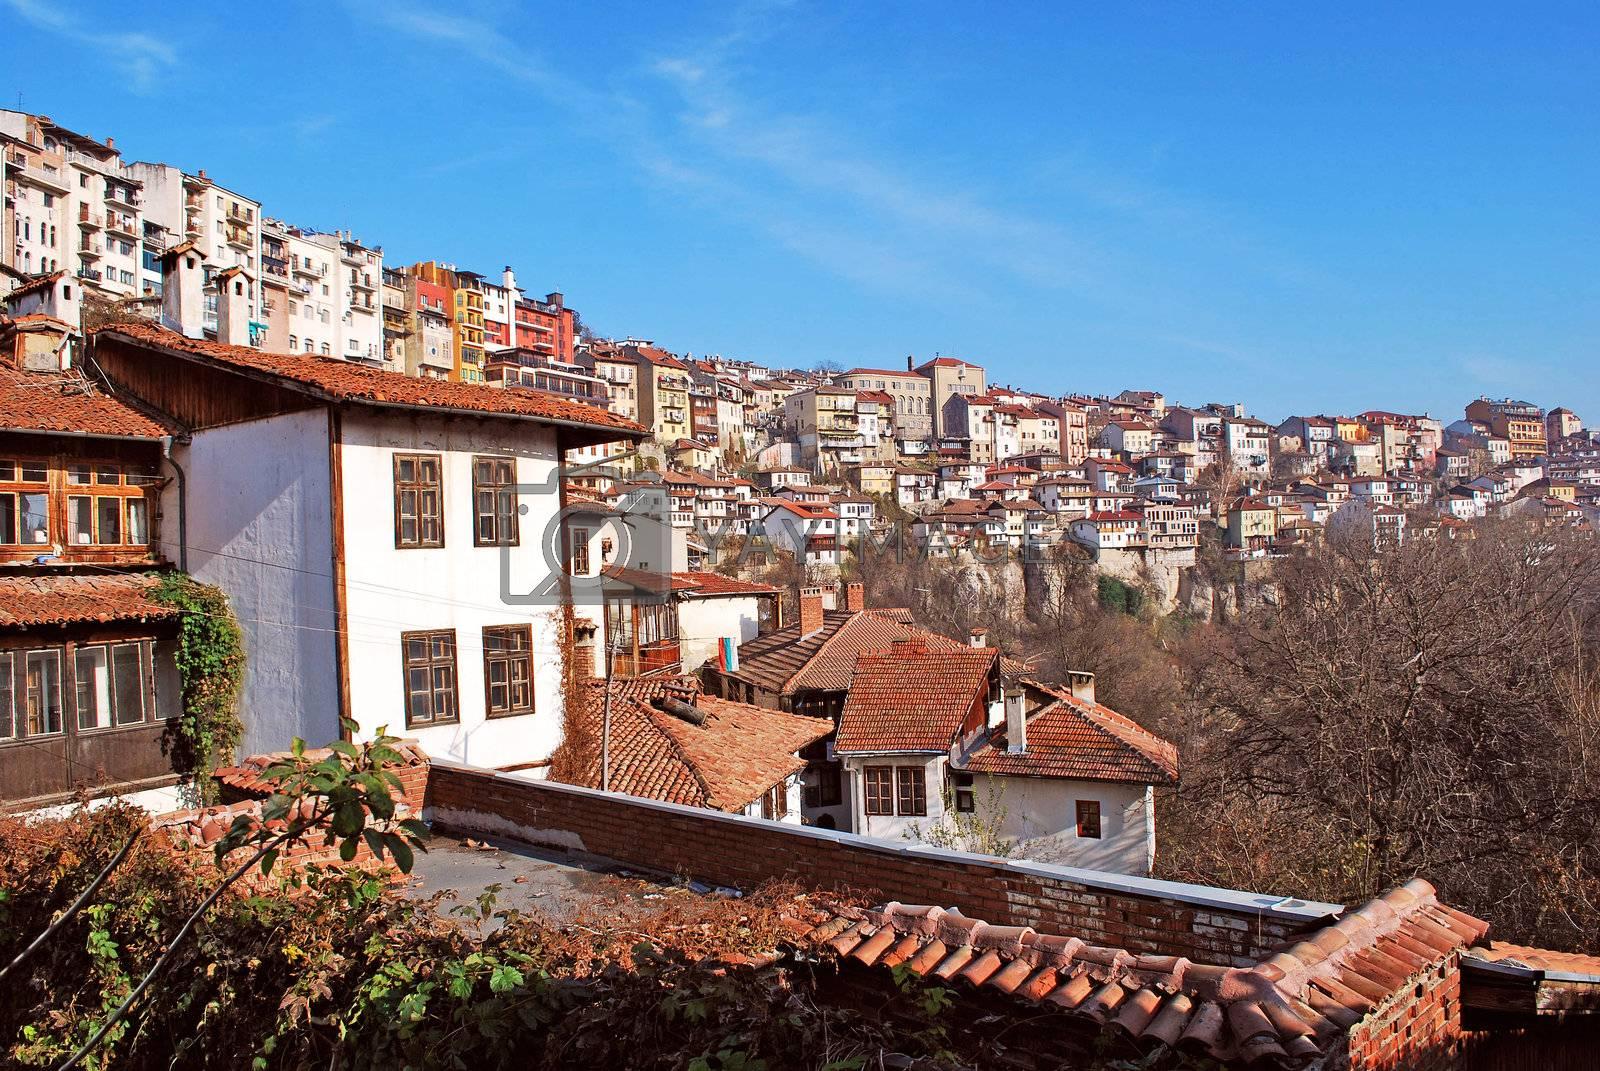 Royalty free image of city view Veliko Turnovo by Dessie_bg